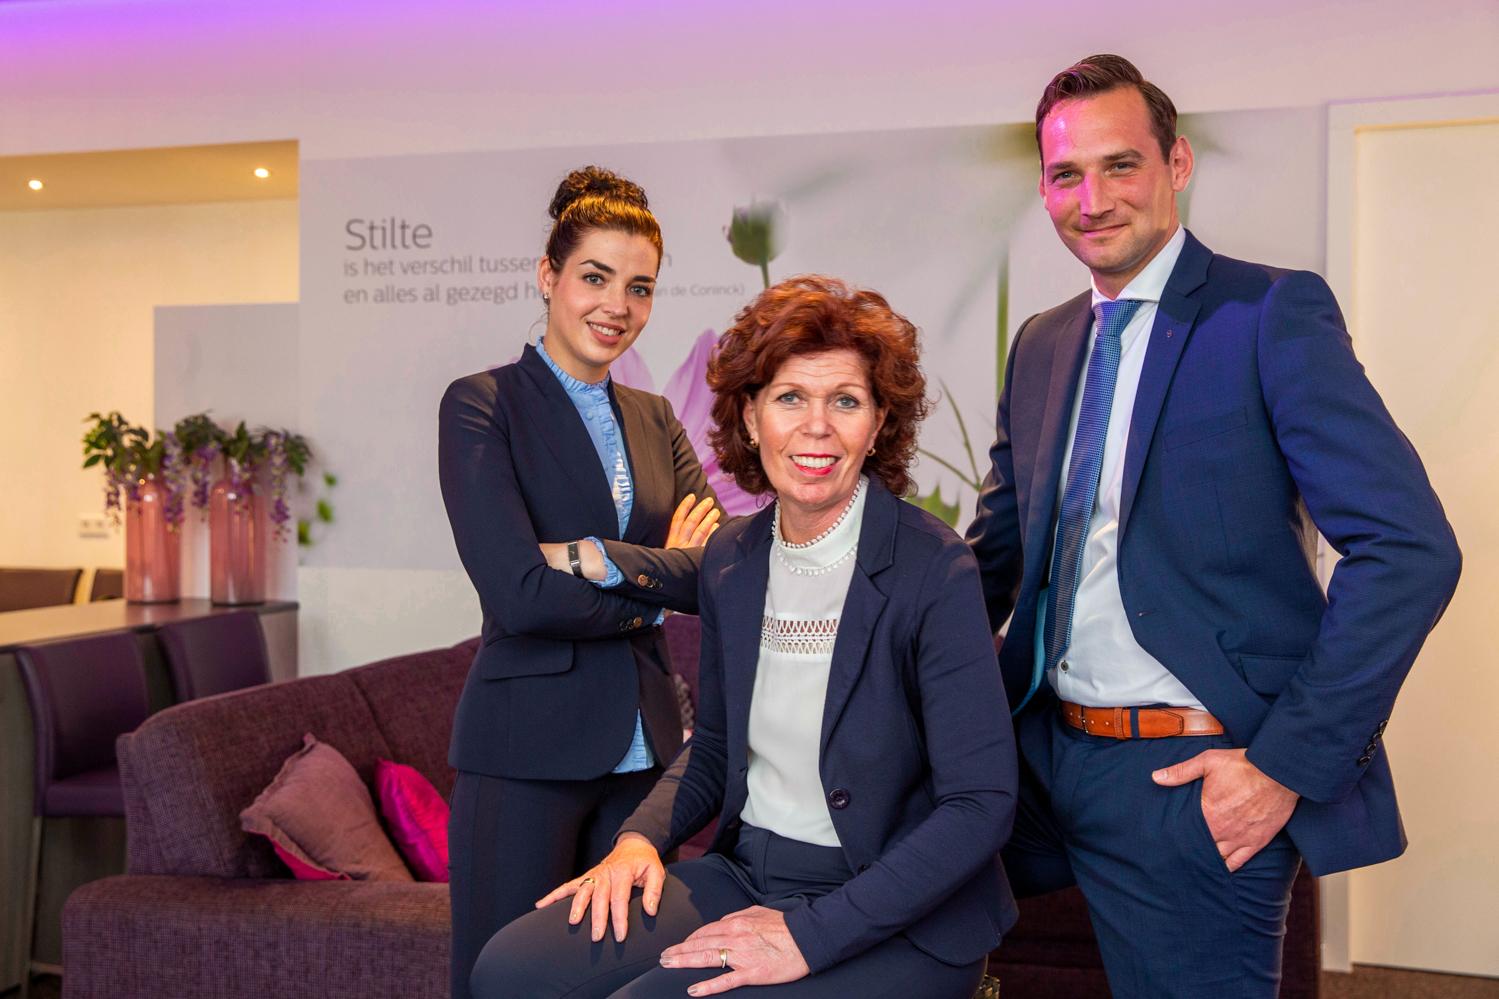 Veldhoen Uitvaartzorg - Christine Veldhoen, Paul van Weert en Sien Hommeles